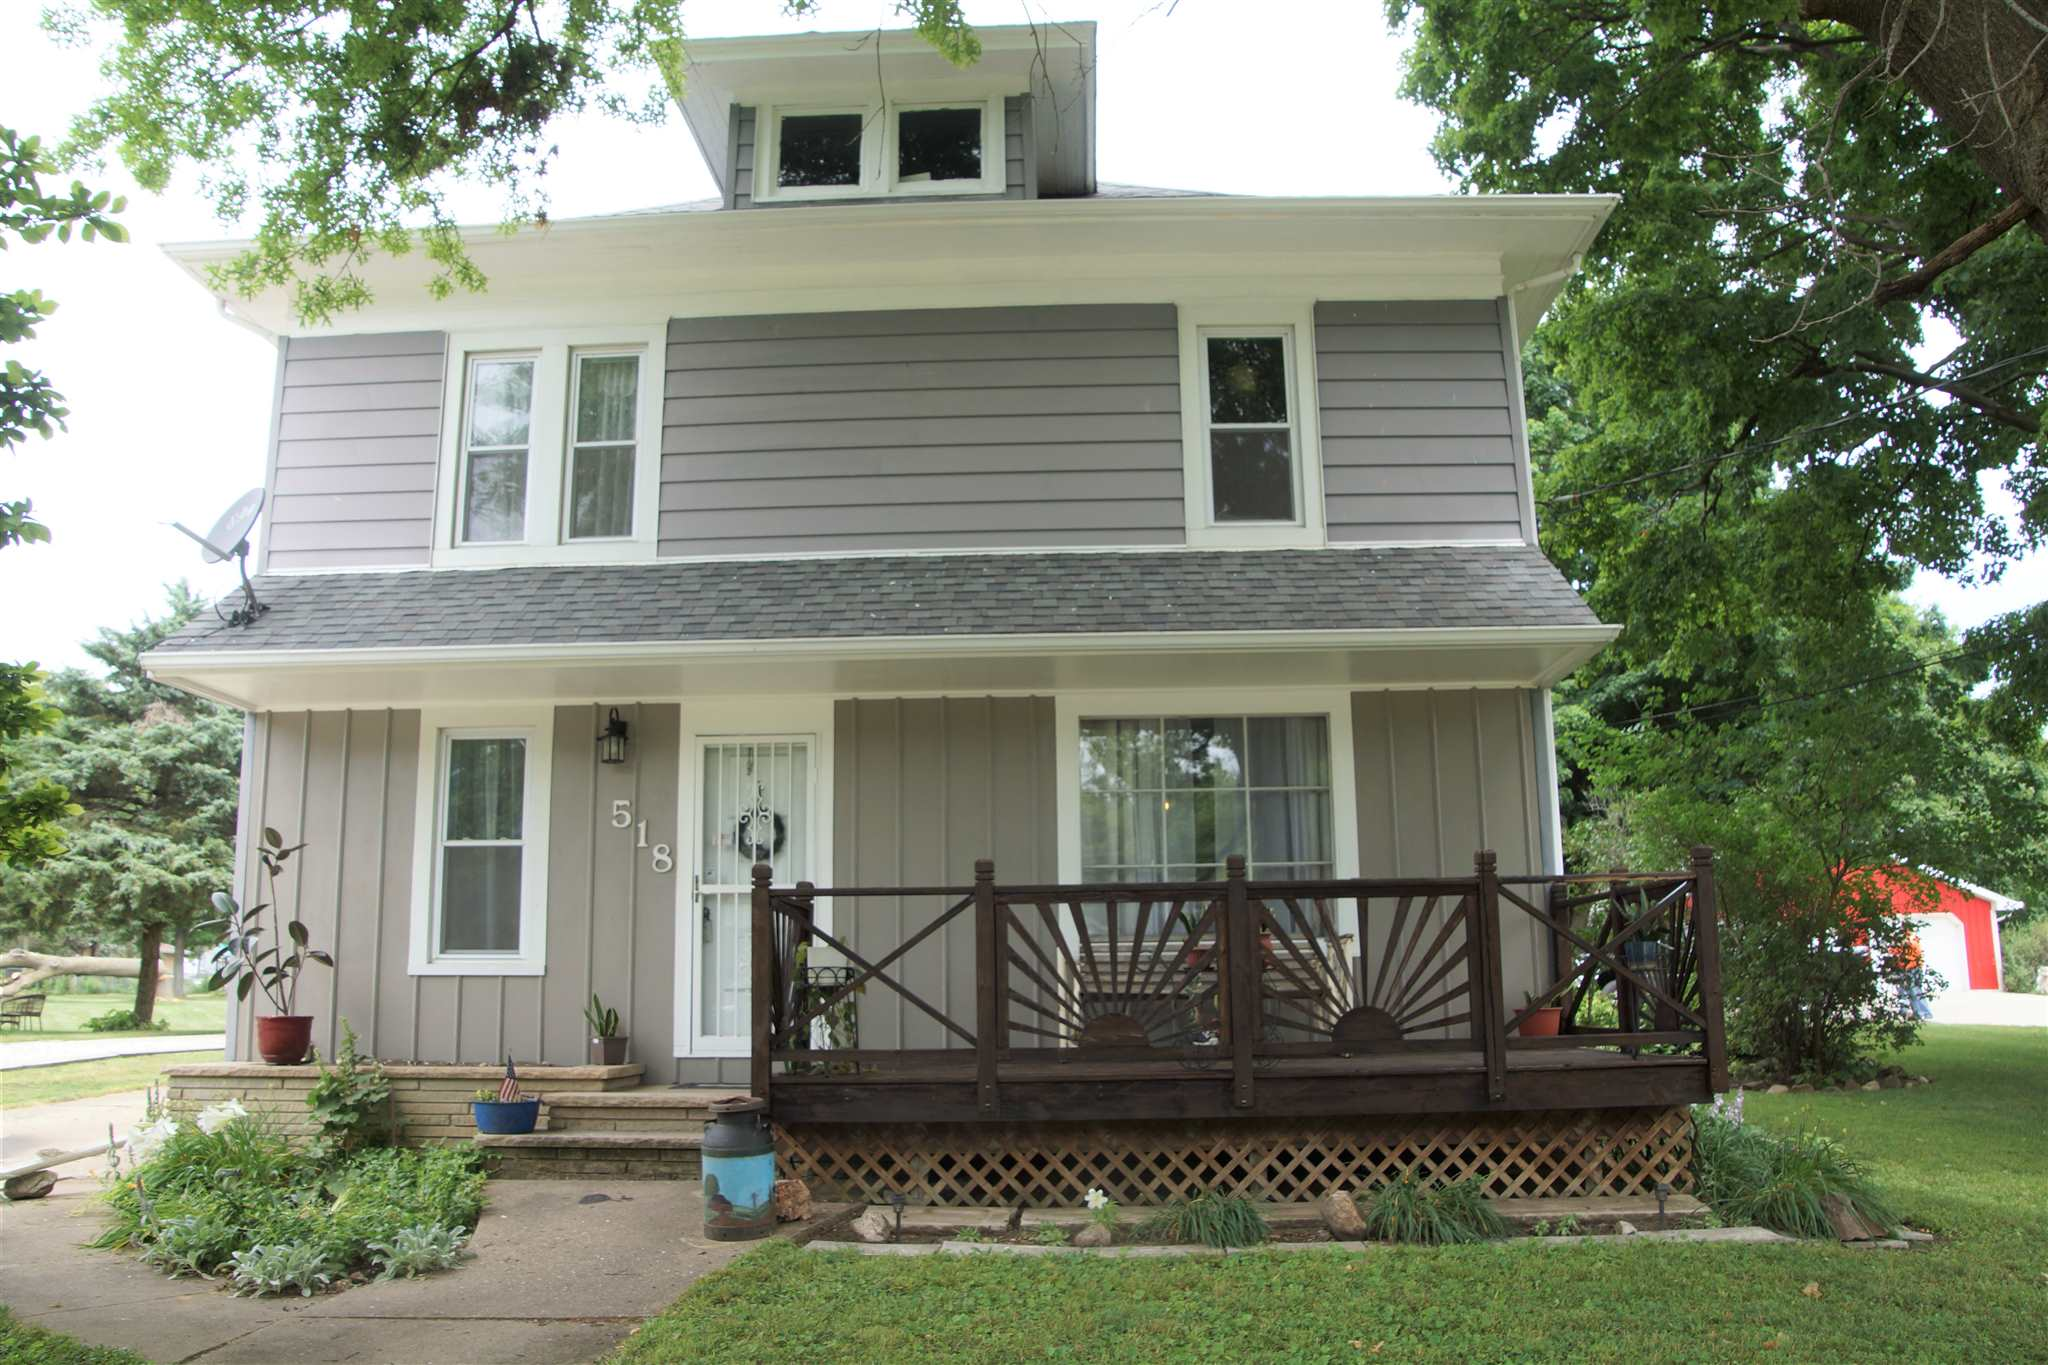 518 E MAIN Property Photo - Princeville, IL real estate listing